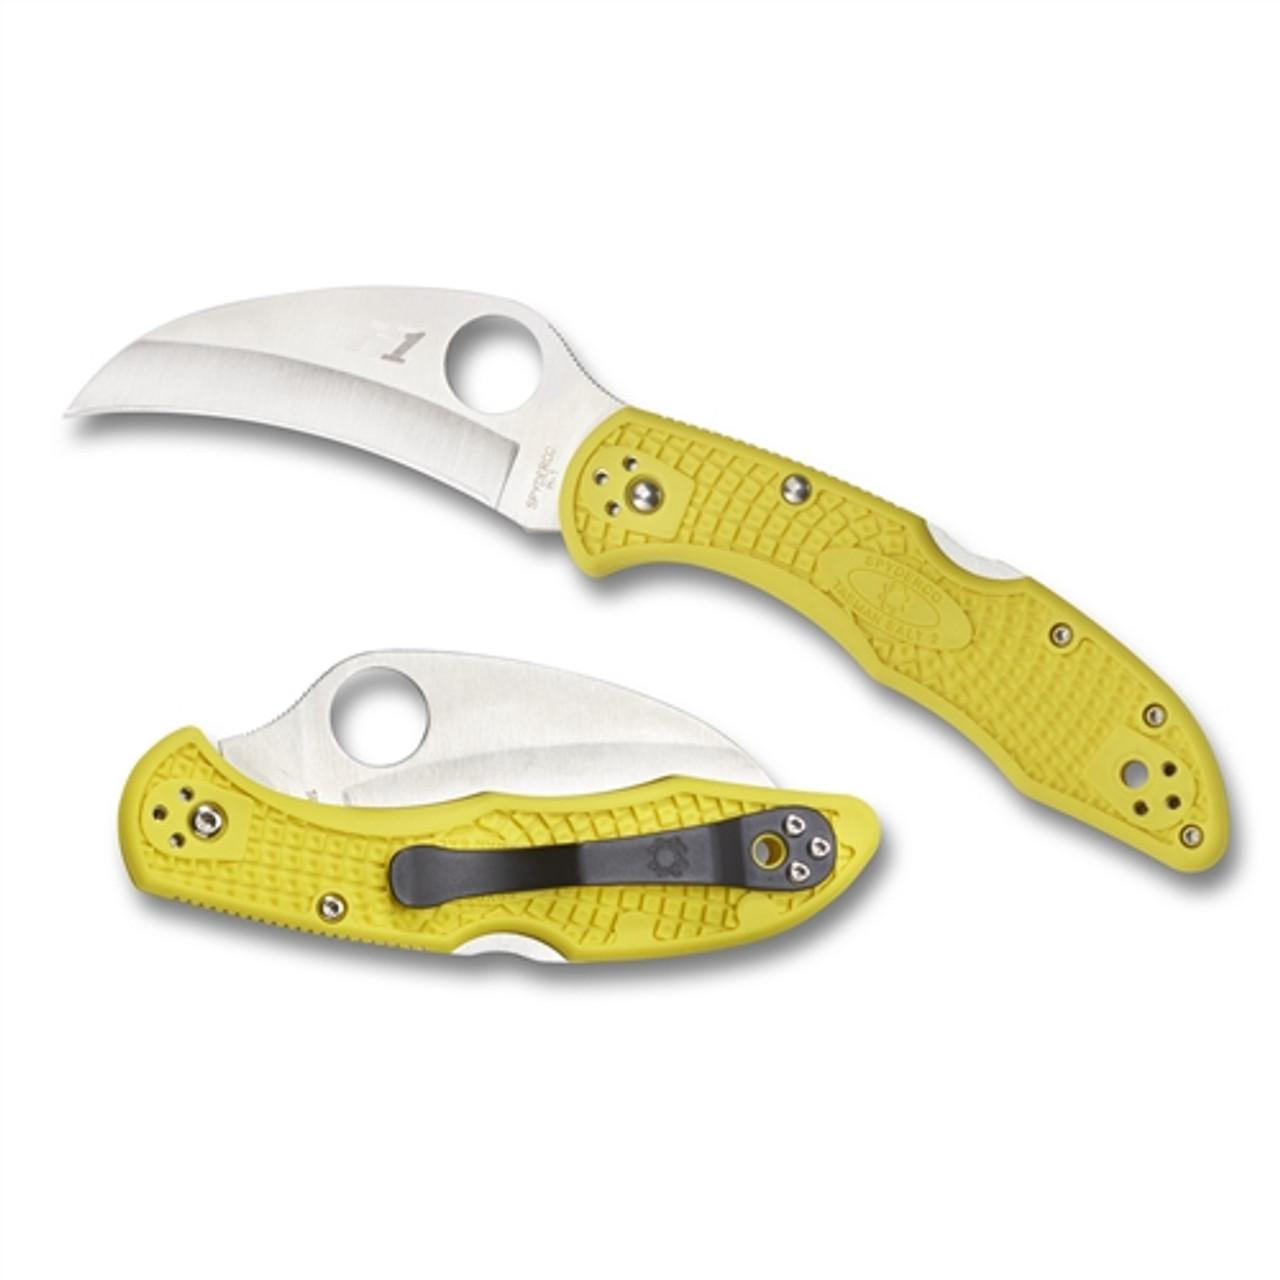 Spyderco C106PYL2 Yellow Tasman Salt 2 Hawkbill Folder Knife, H-1 Satin Blade